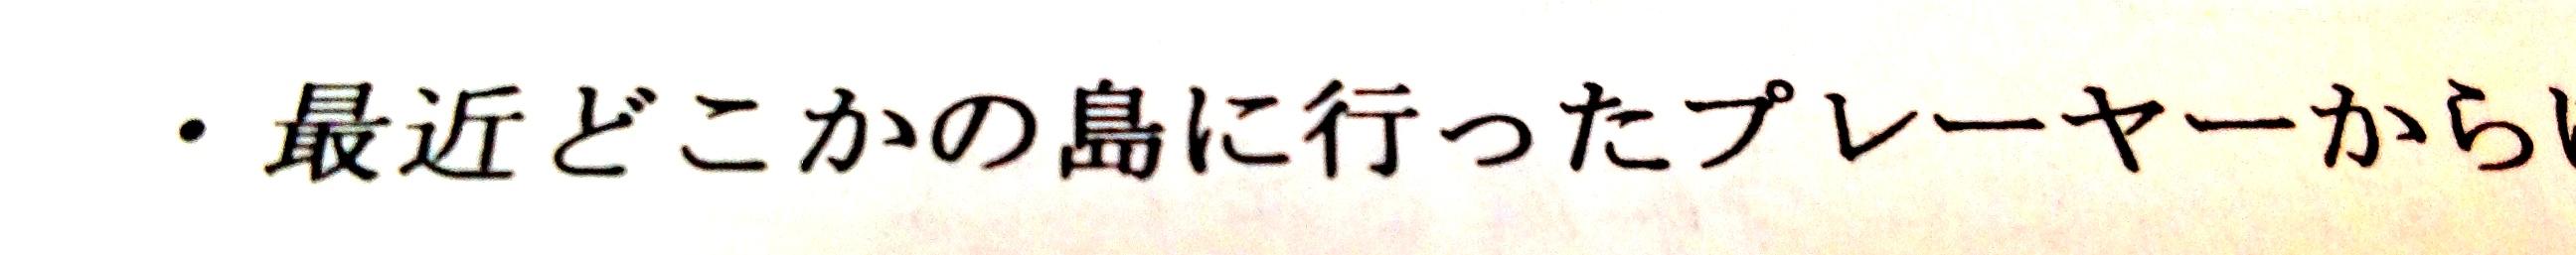 201411161937553a0.jpg